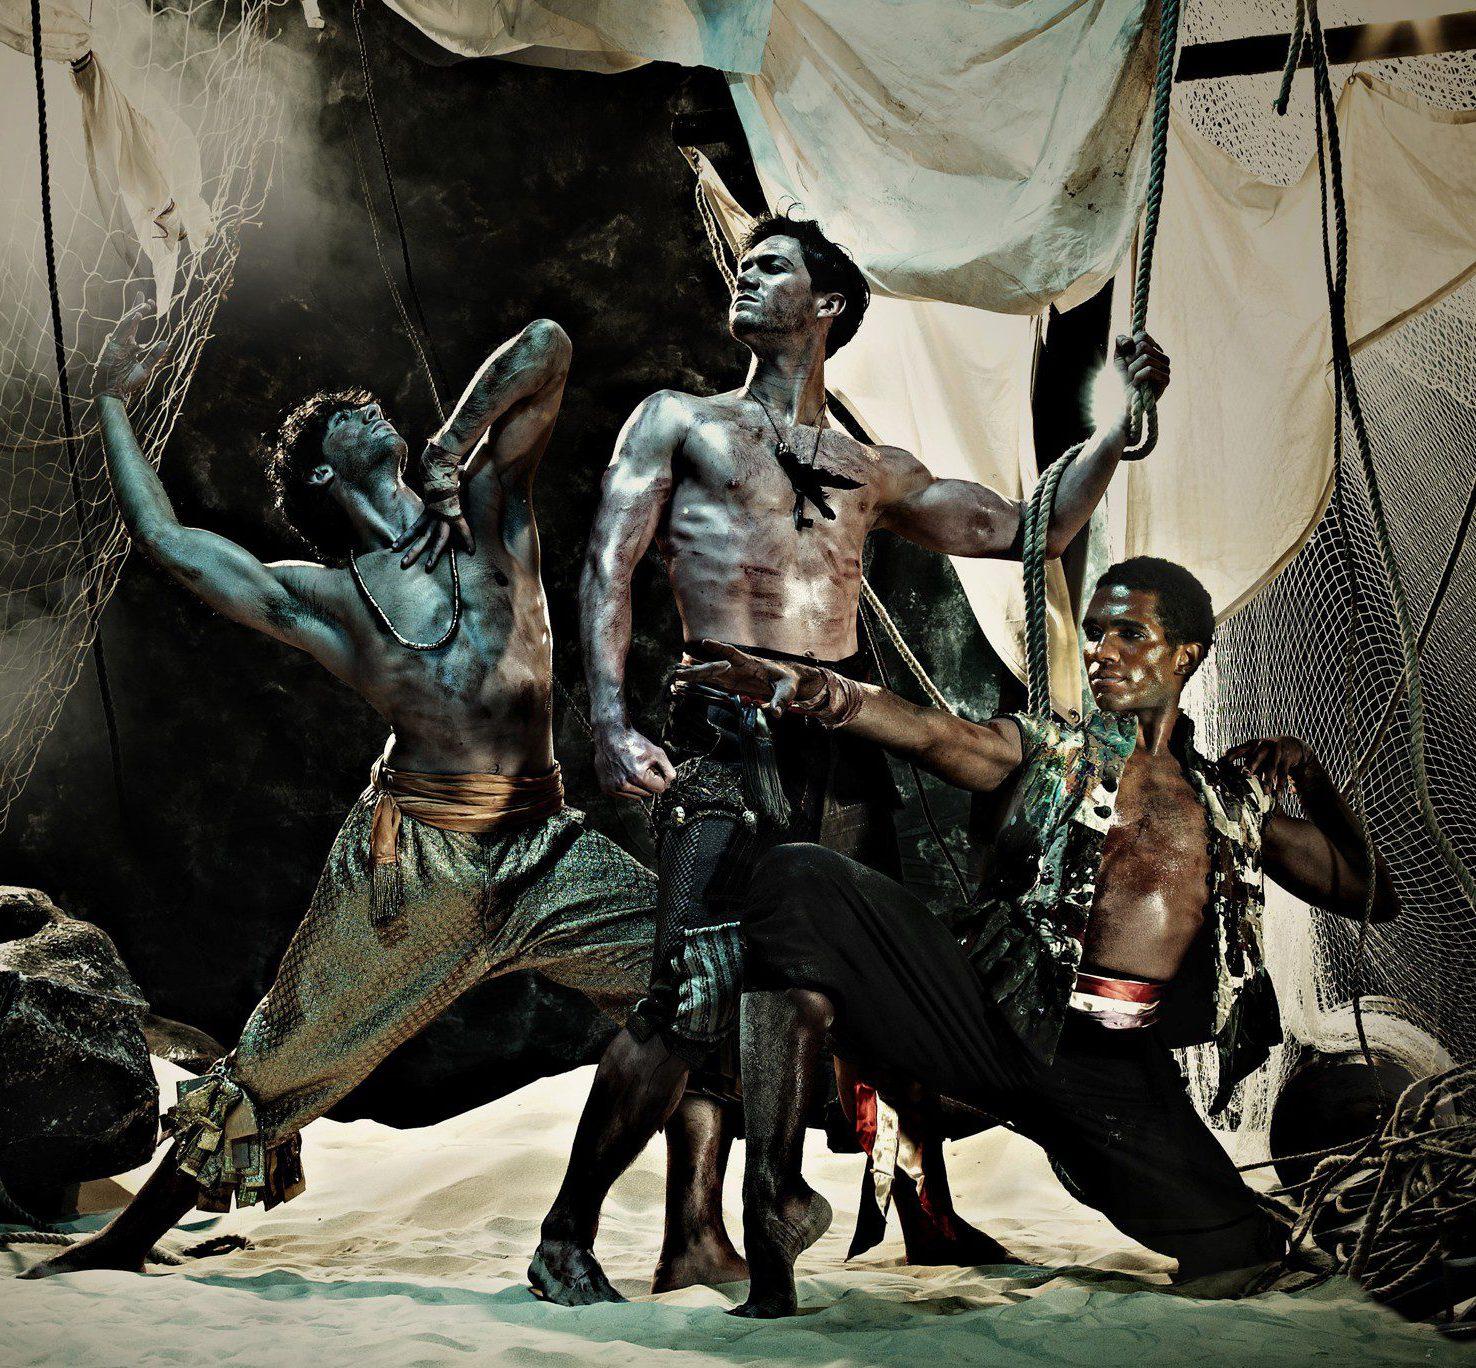 'Le Corsaire': ENB Dancers Esteban Berlanga, Max Westwell and Junor Souza photographed by Guy Farrow